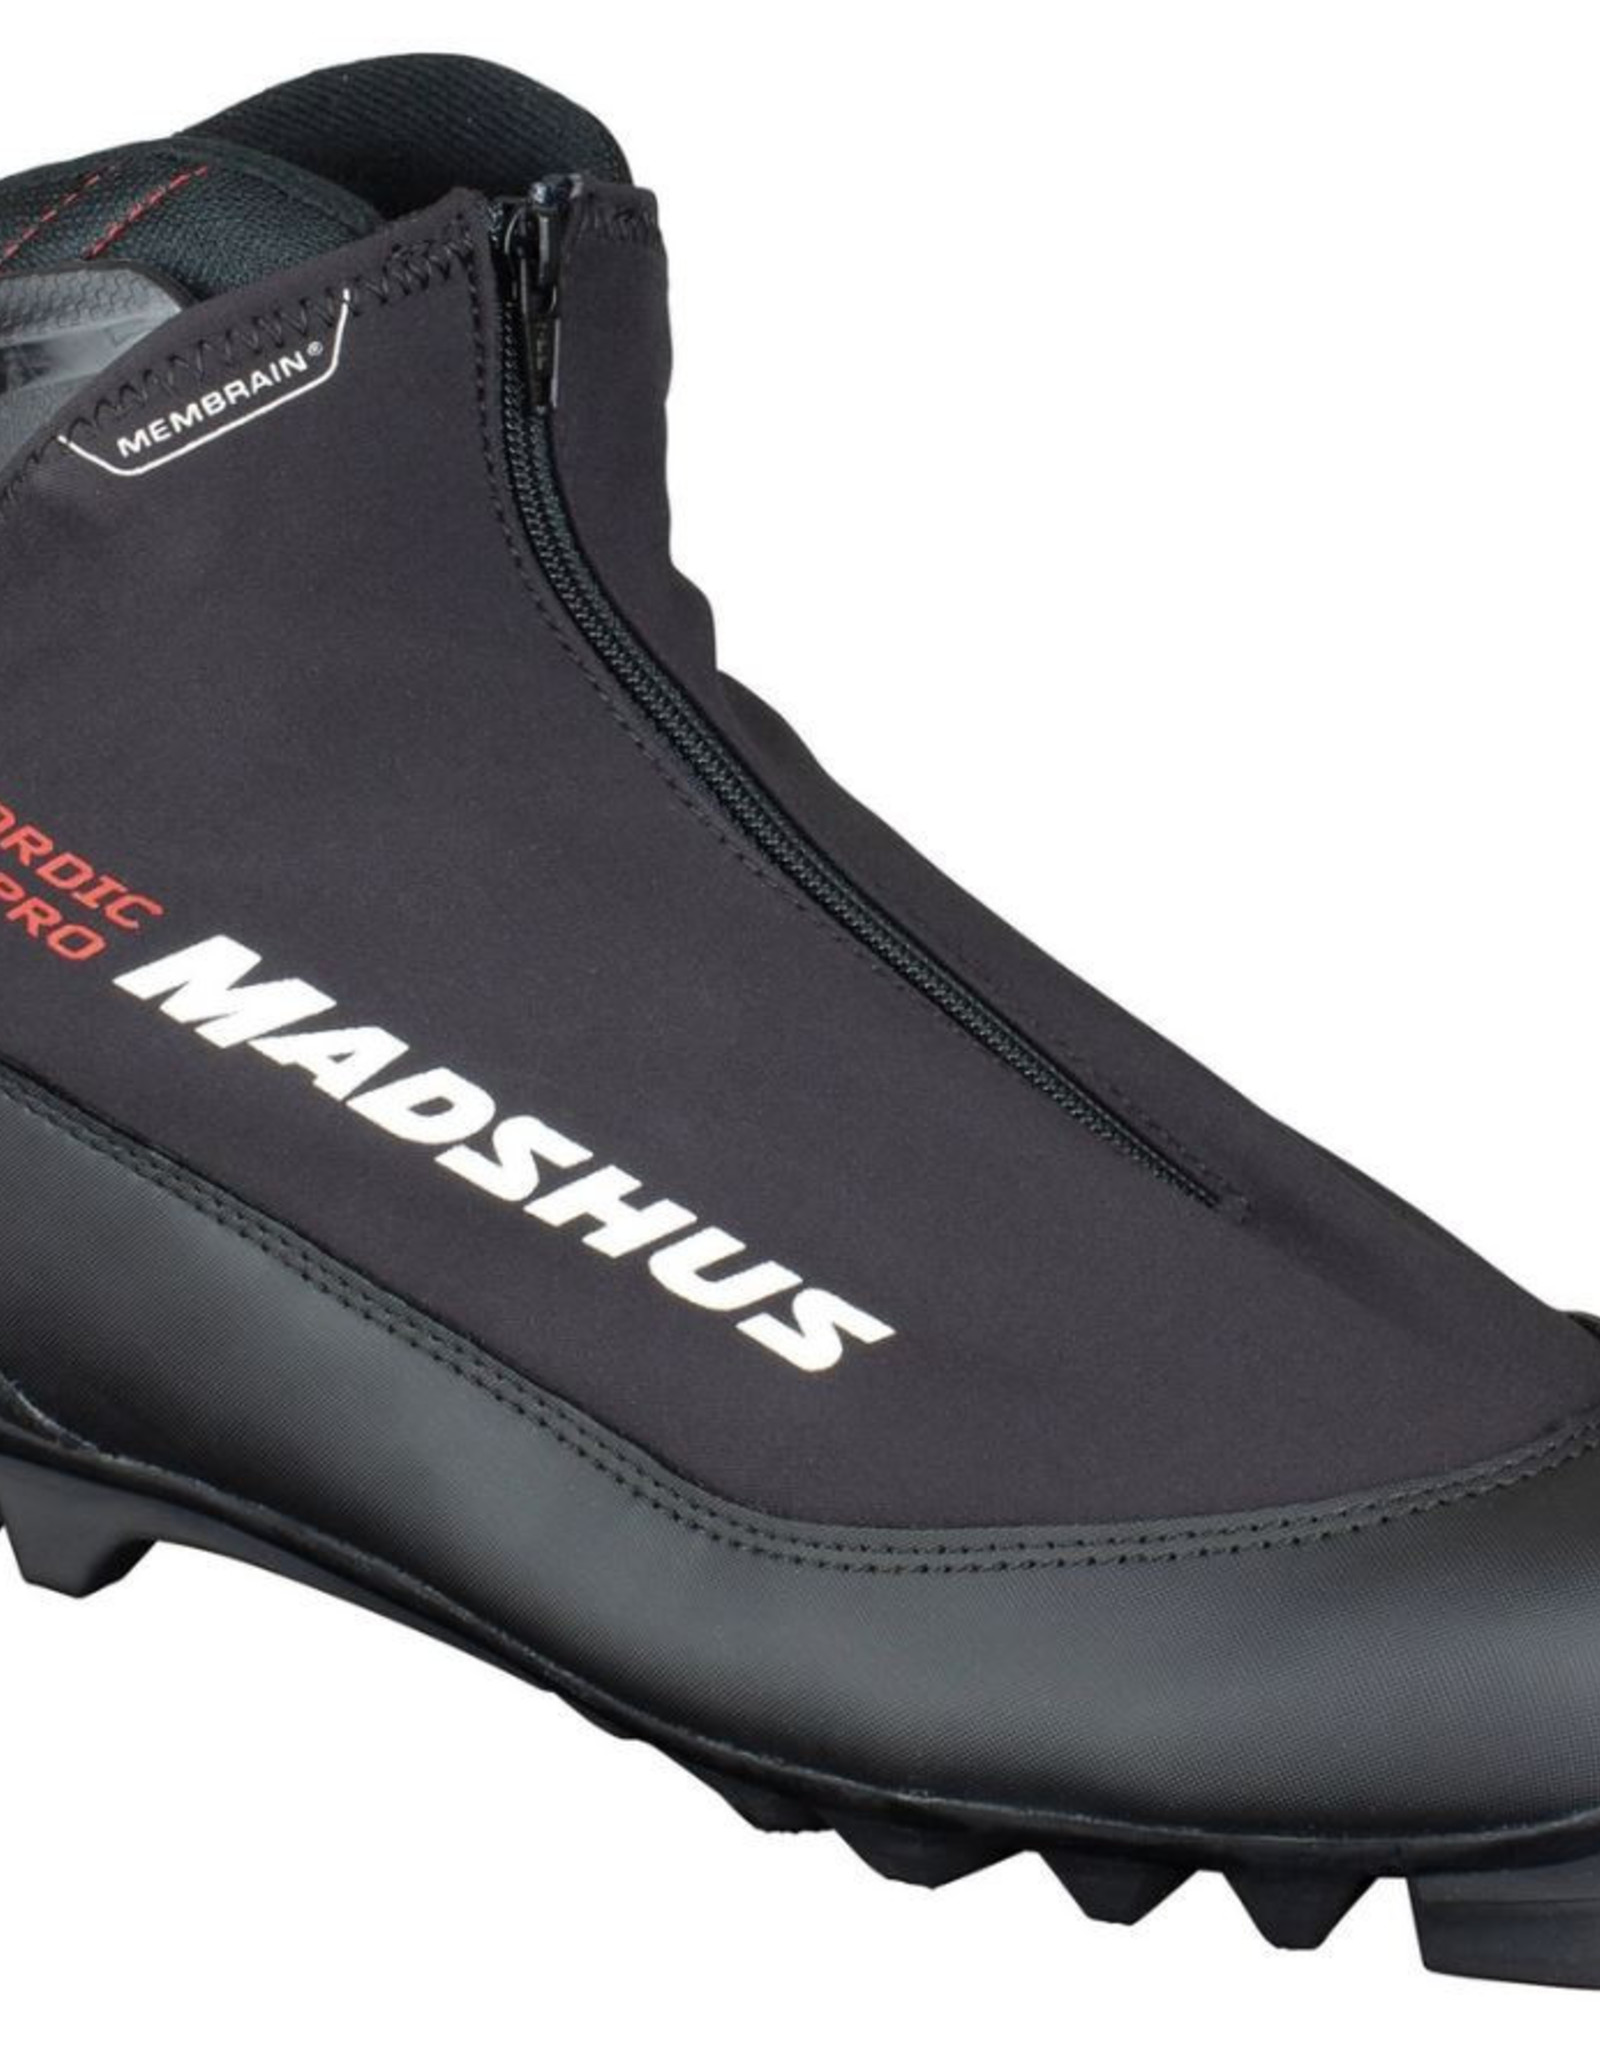 Madshus Nordic Boot